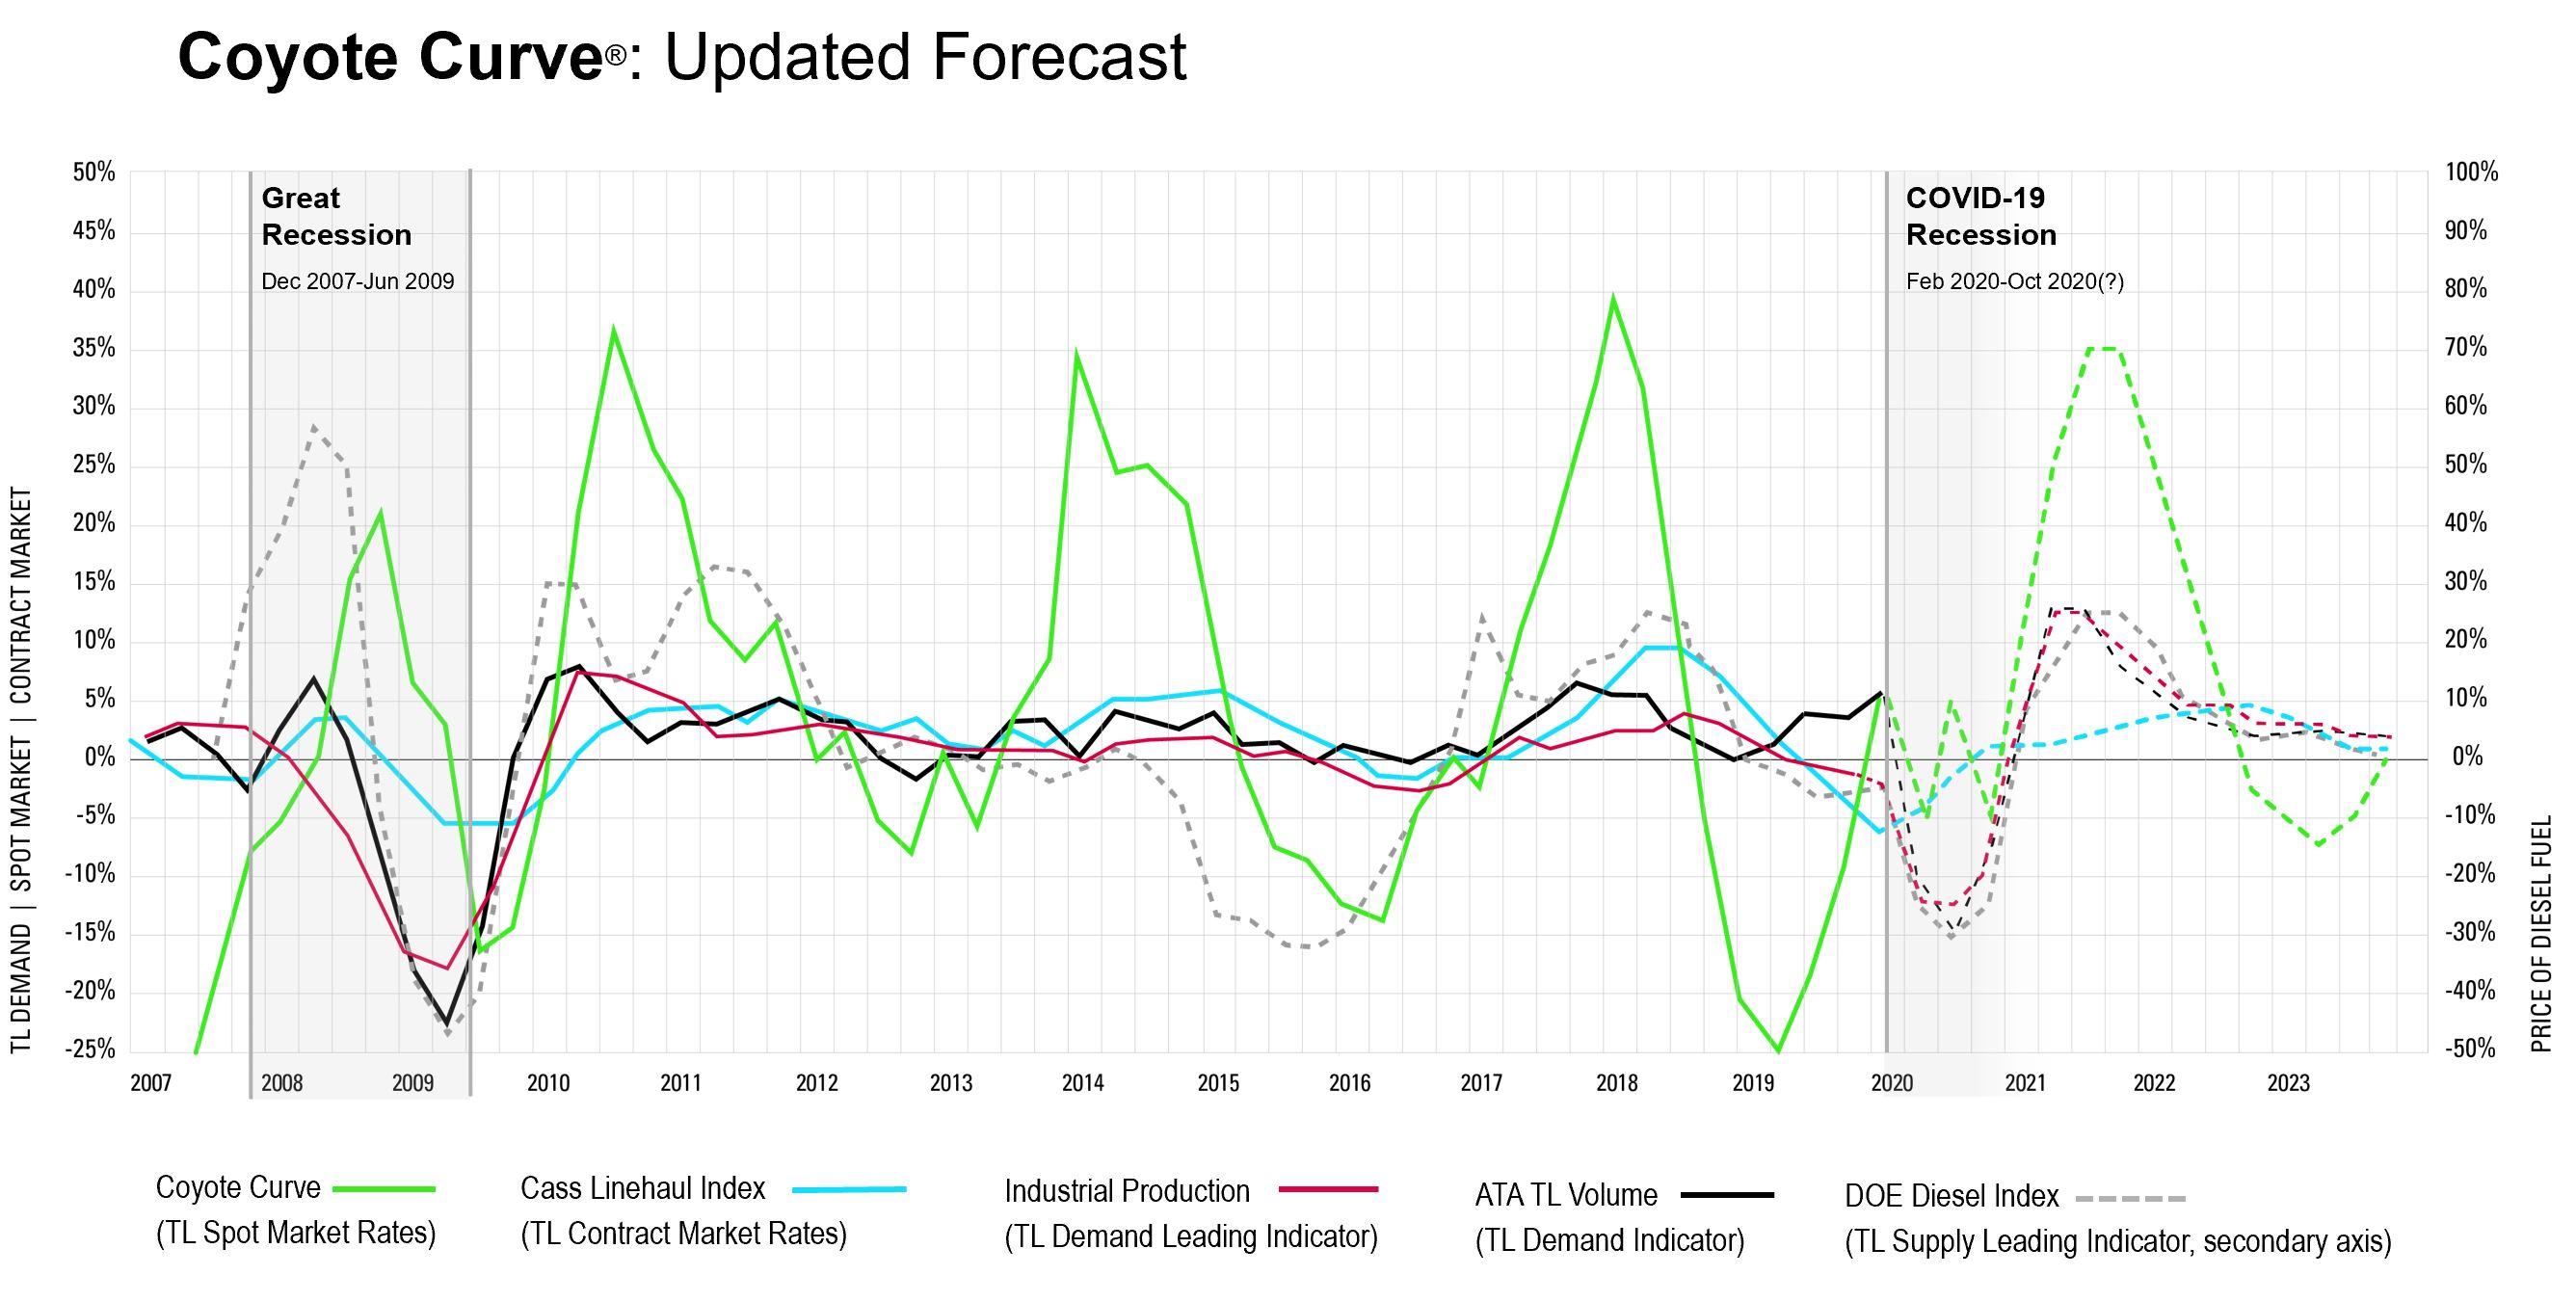 Coyote Curve, Q2 2020 Forecast